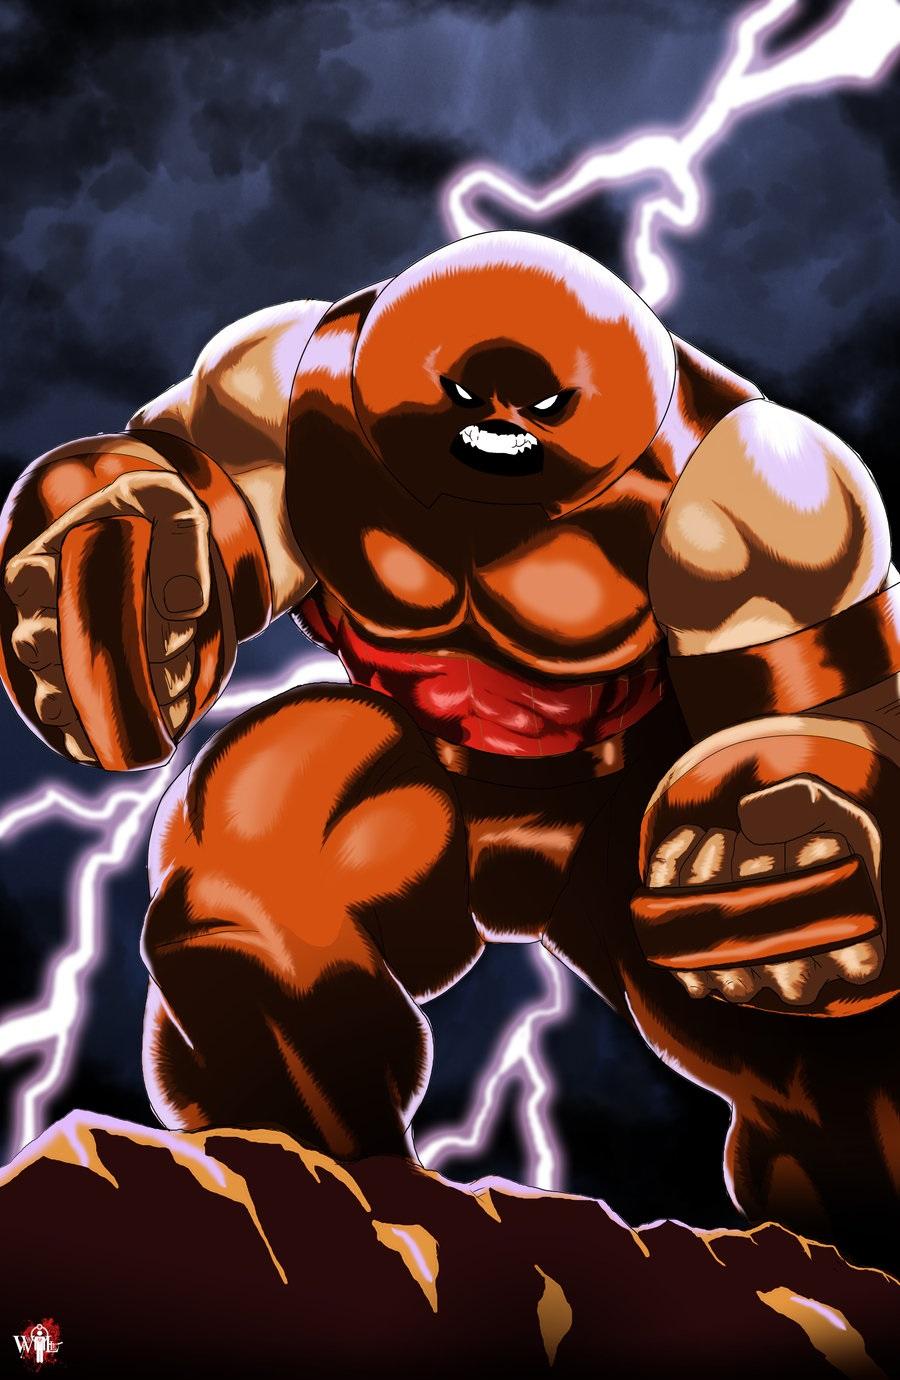 Cain | The Shadowhunters' Wiki | FANDOM powered by Wikia